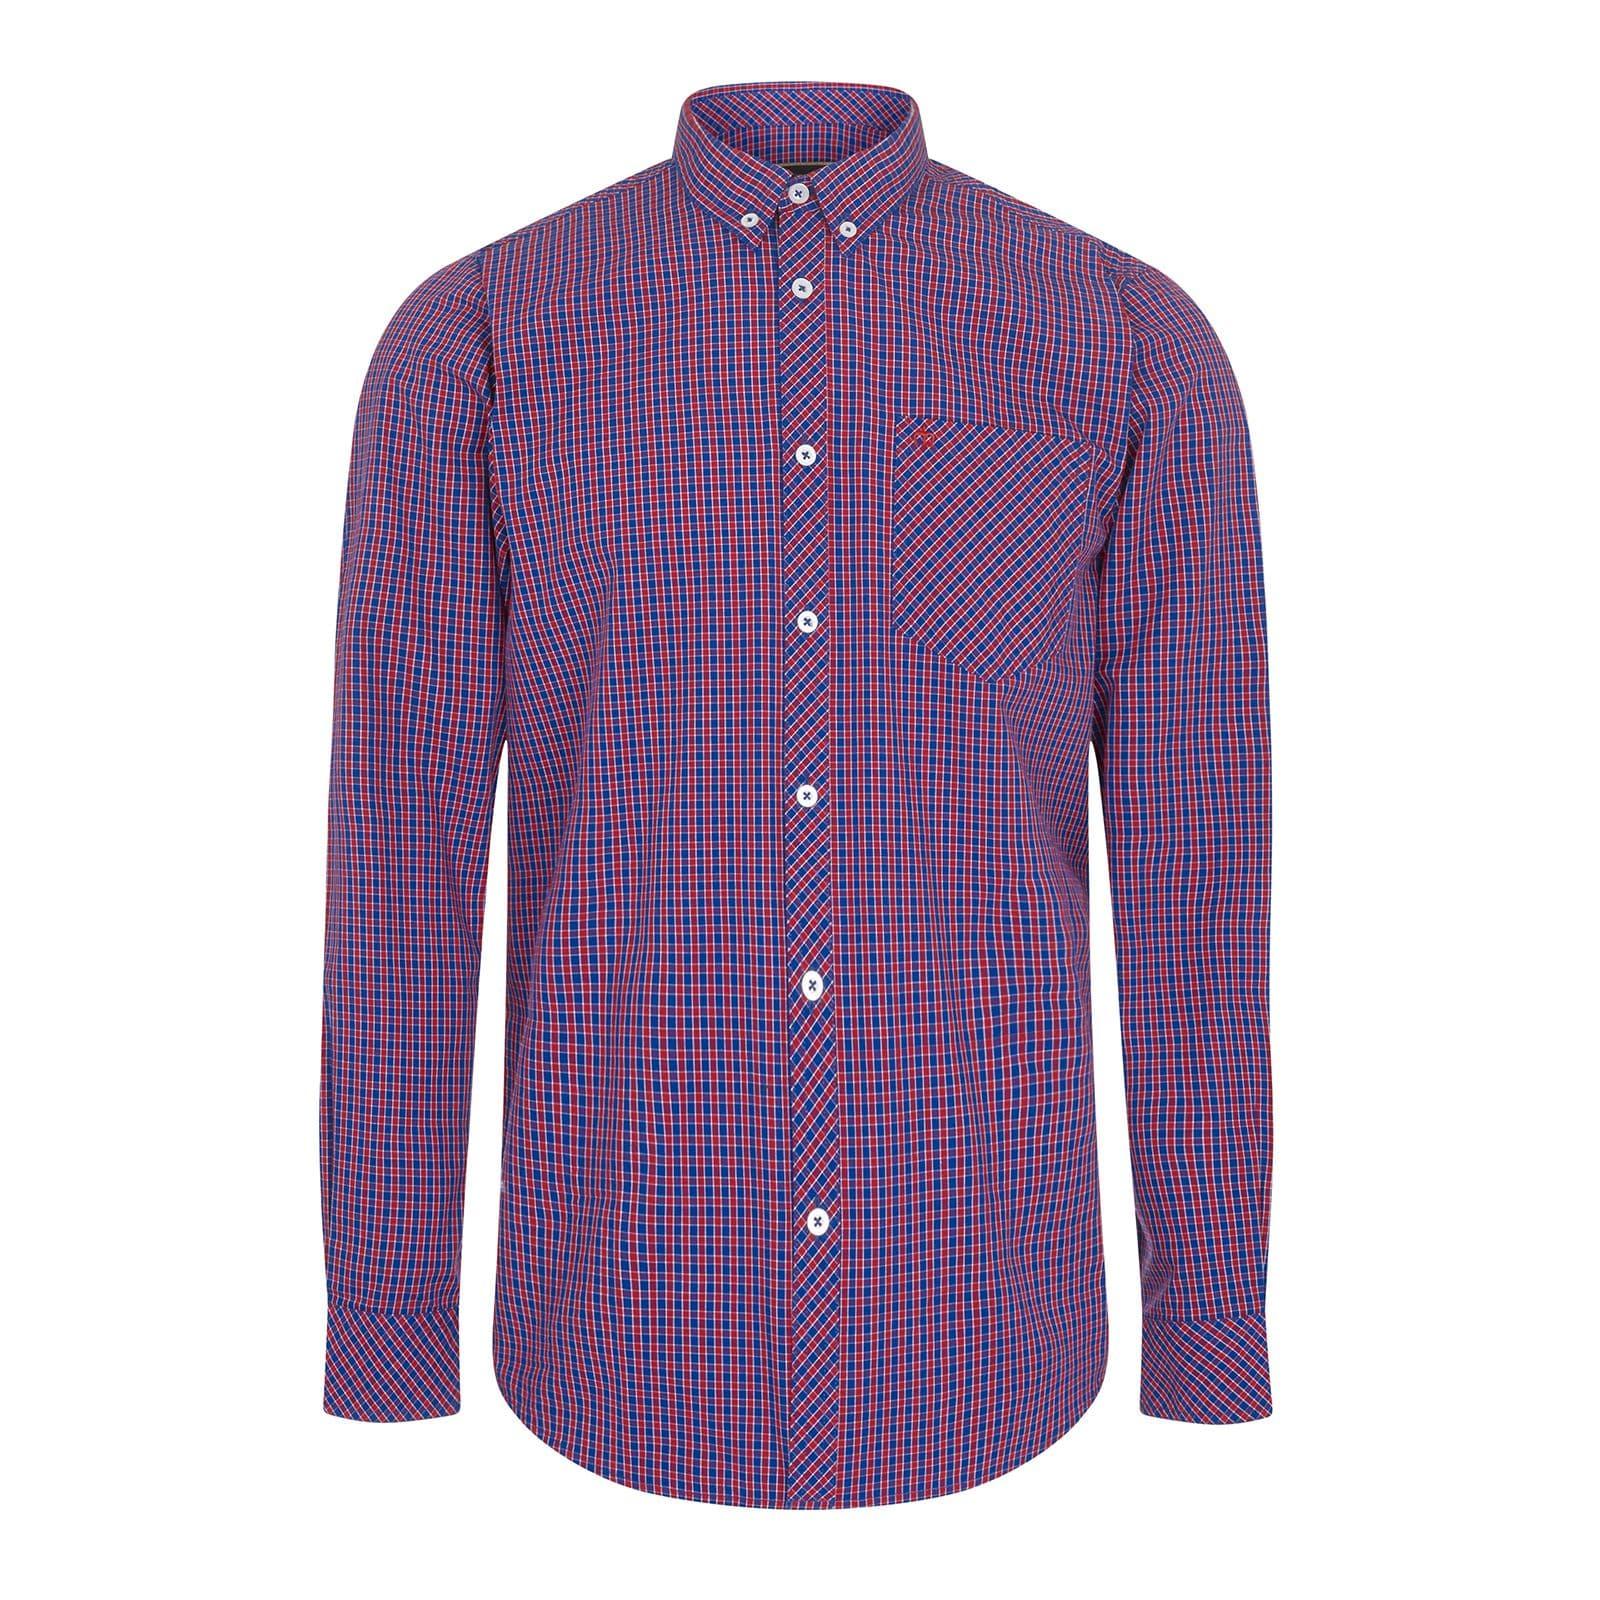 Рубашка ReigateРубашки под заказ<br><br><br>Артикул: 1517211<br>Материал: 100% хлопок<br>Цвет: красно-сине-белая клетка<br>Пол: Мужской